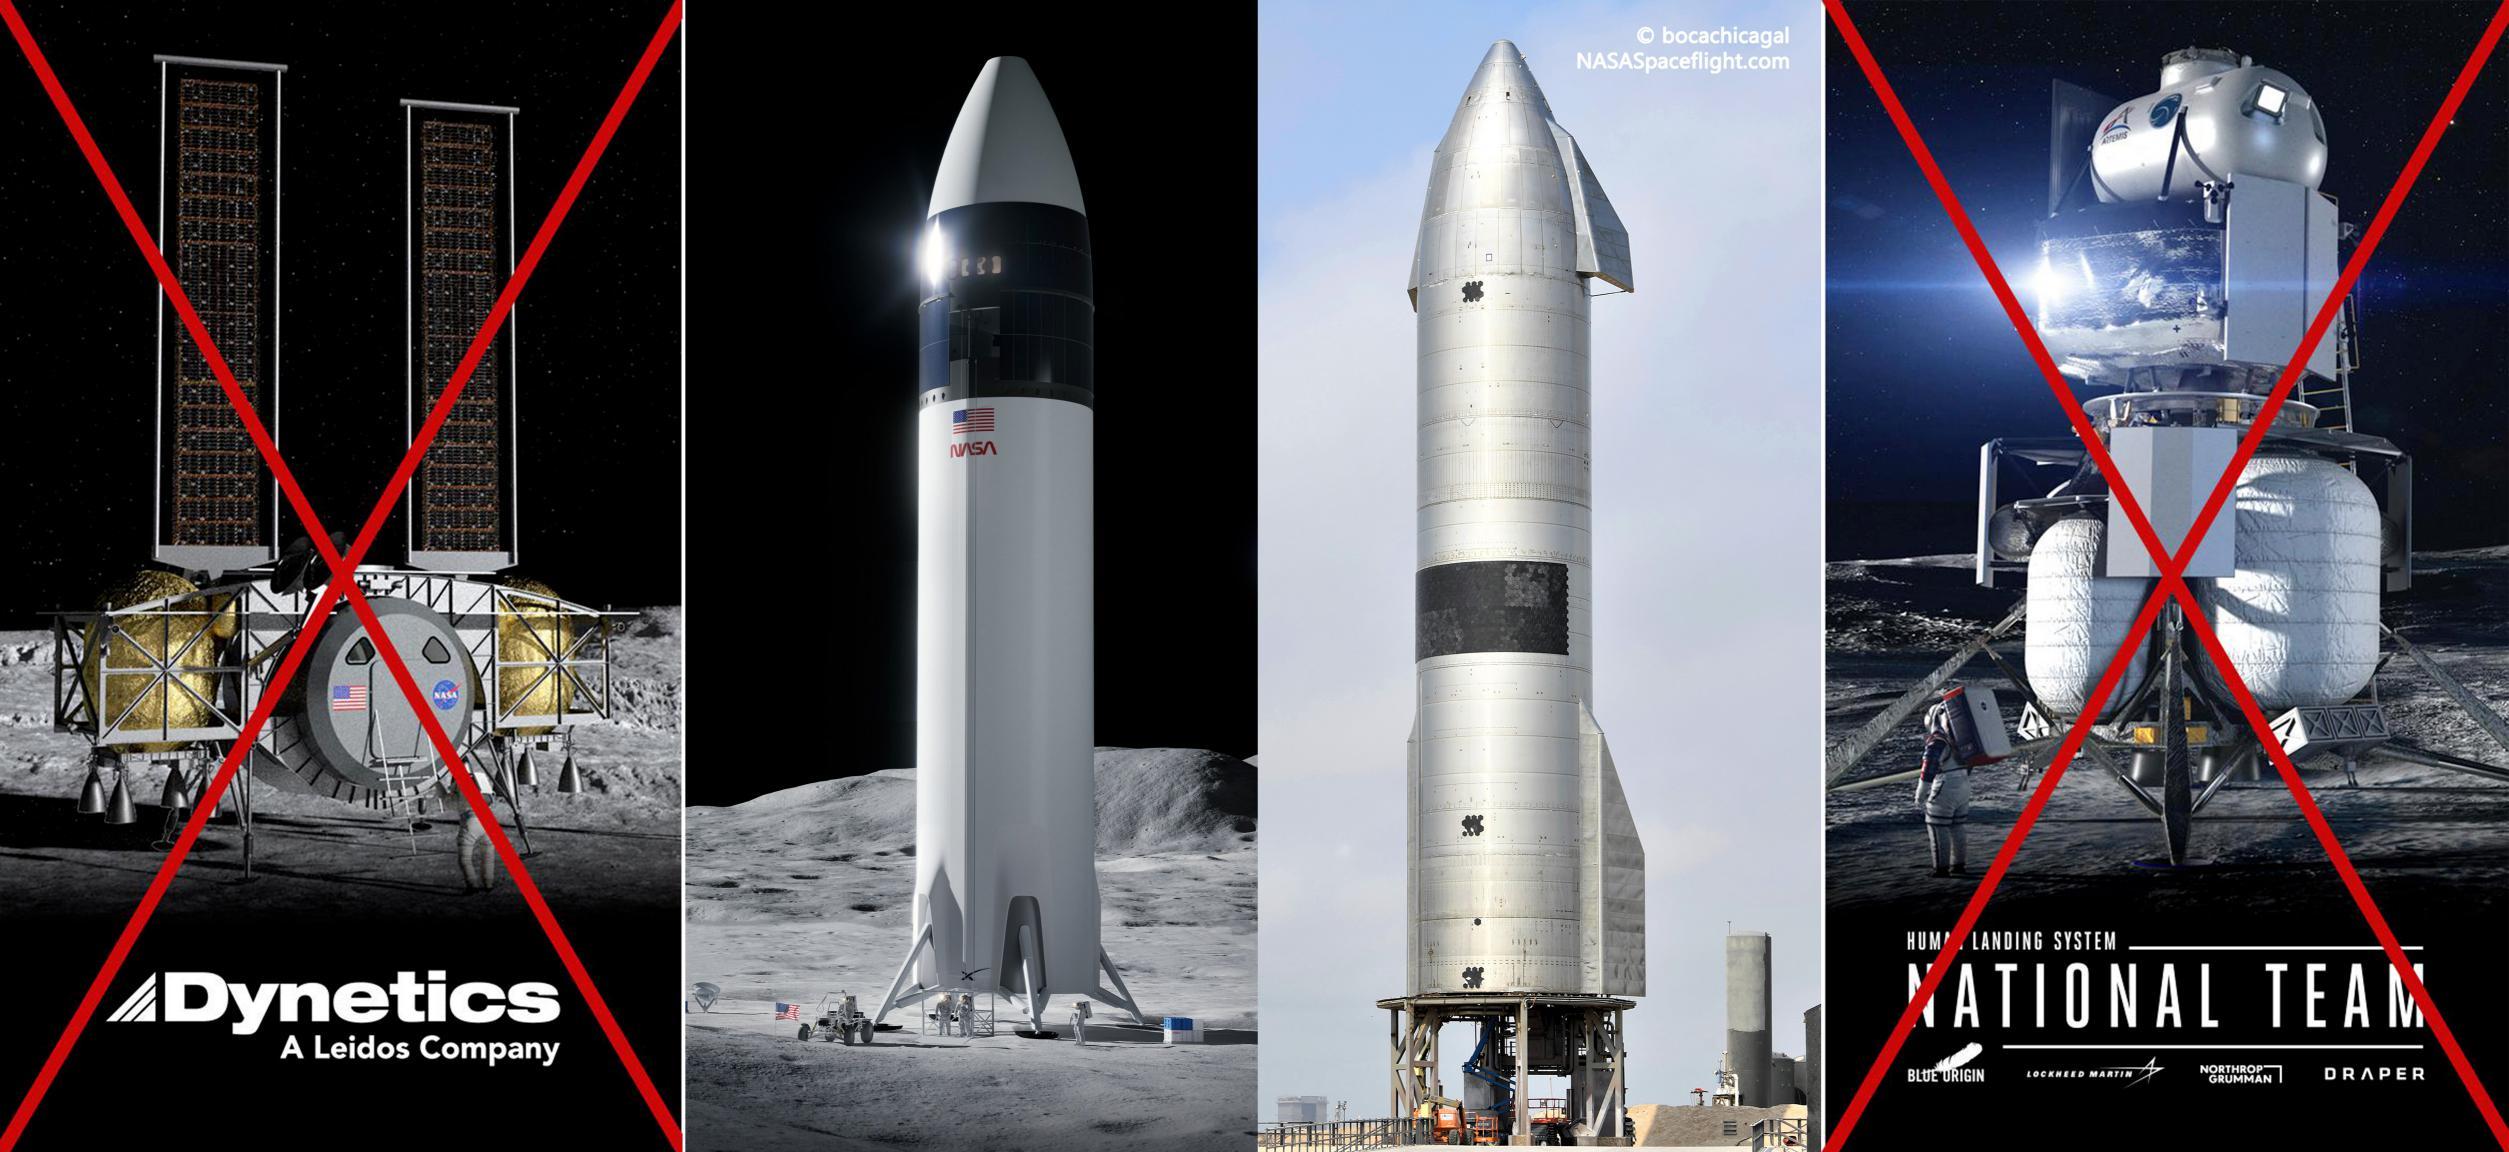 Lunar Starship SN15 Blue Origin Dynetics (NASA + bocachicagal) 1 (c)